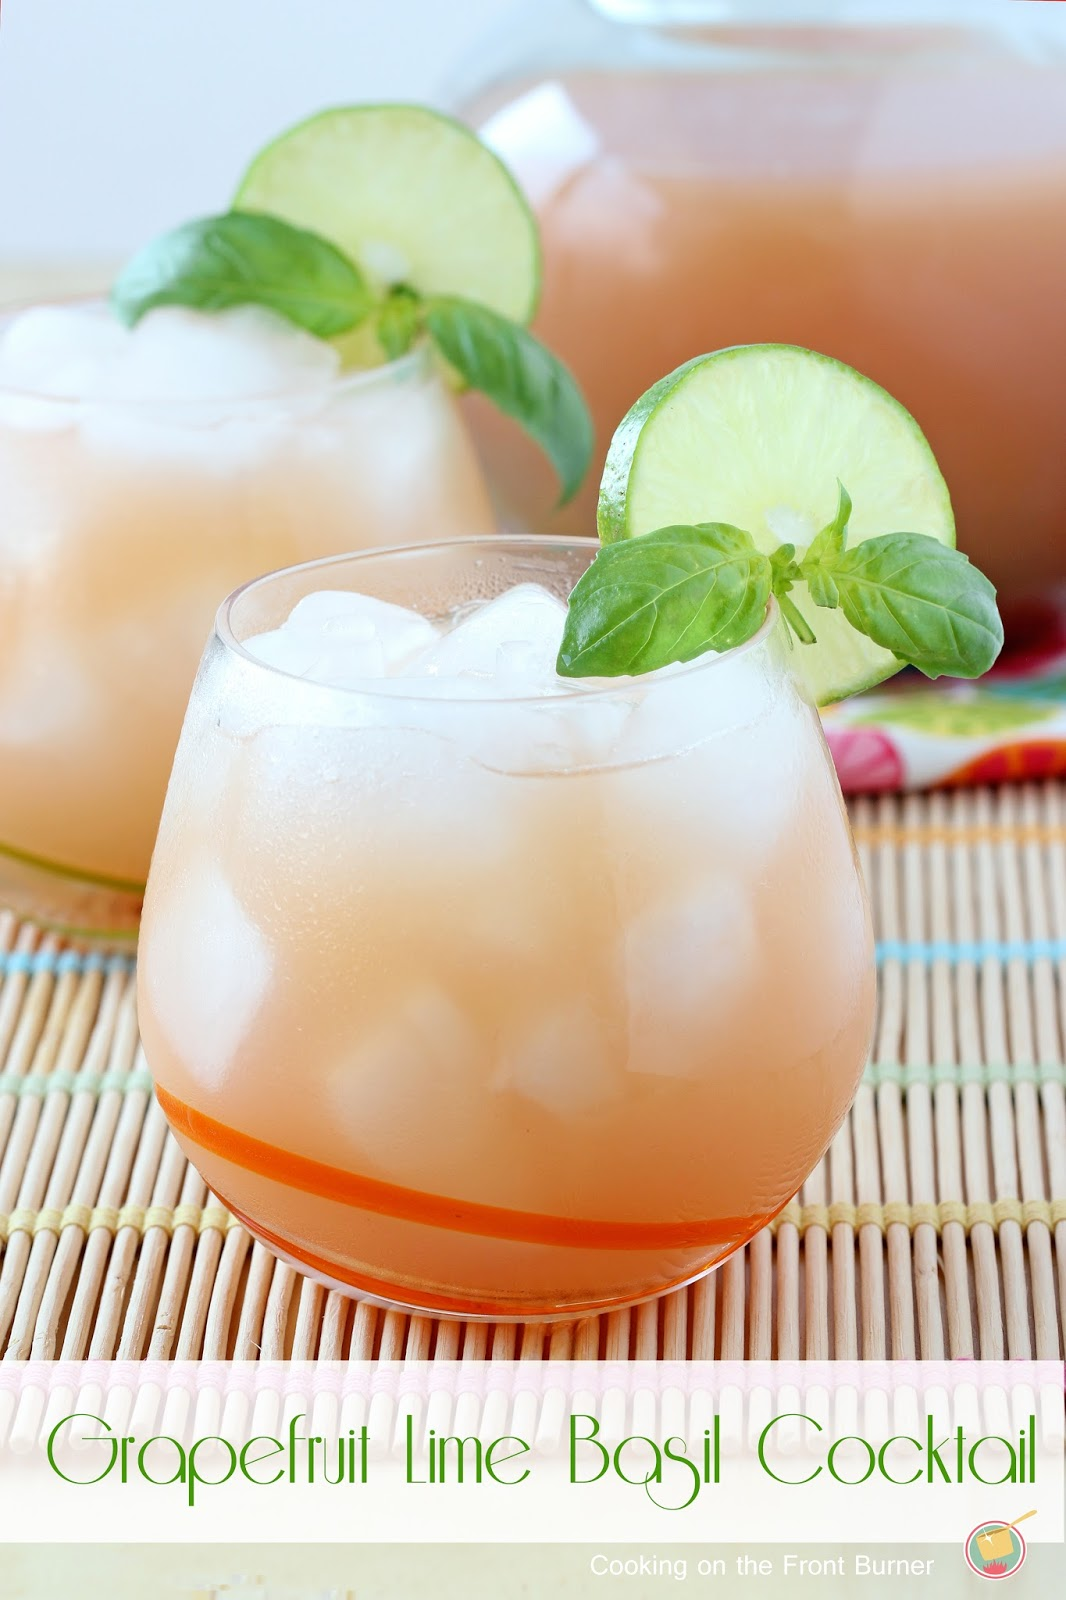 Grapefruit Lime Basil Cocktail - a refreshing summer drink infused with basil flavor   Cooking on the Front Burner #cocktails #summerdrinks